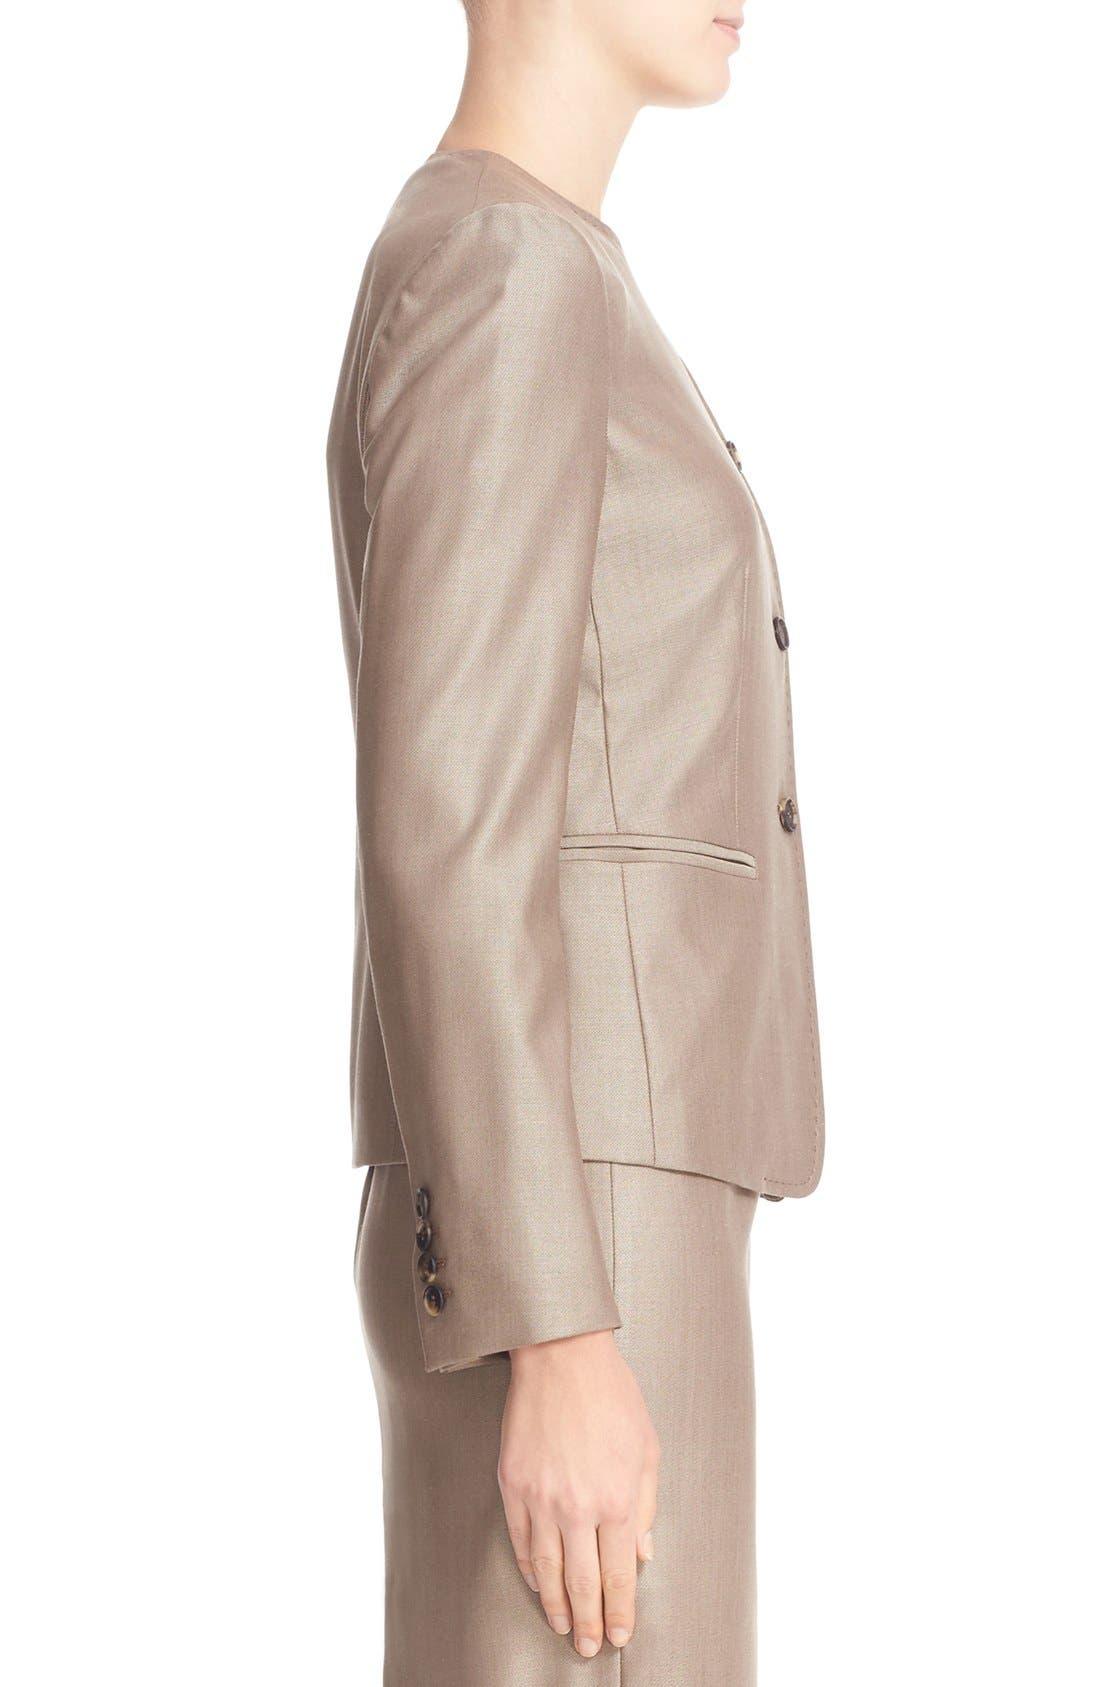 Erba Asymmetrical Jacket,                             Alternate thumbnail 11, color,                             220